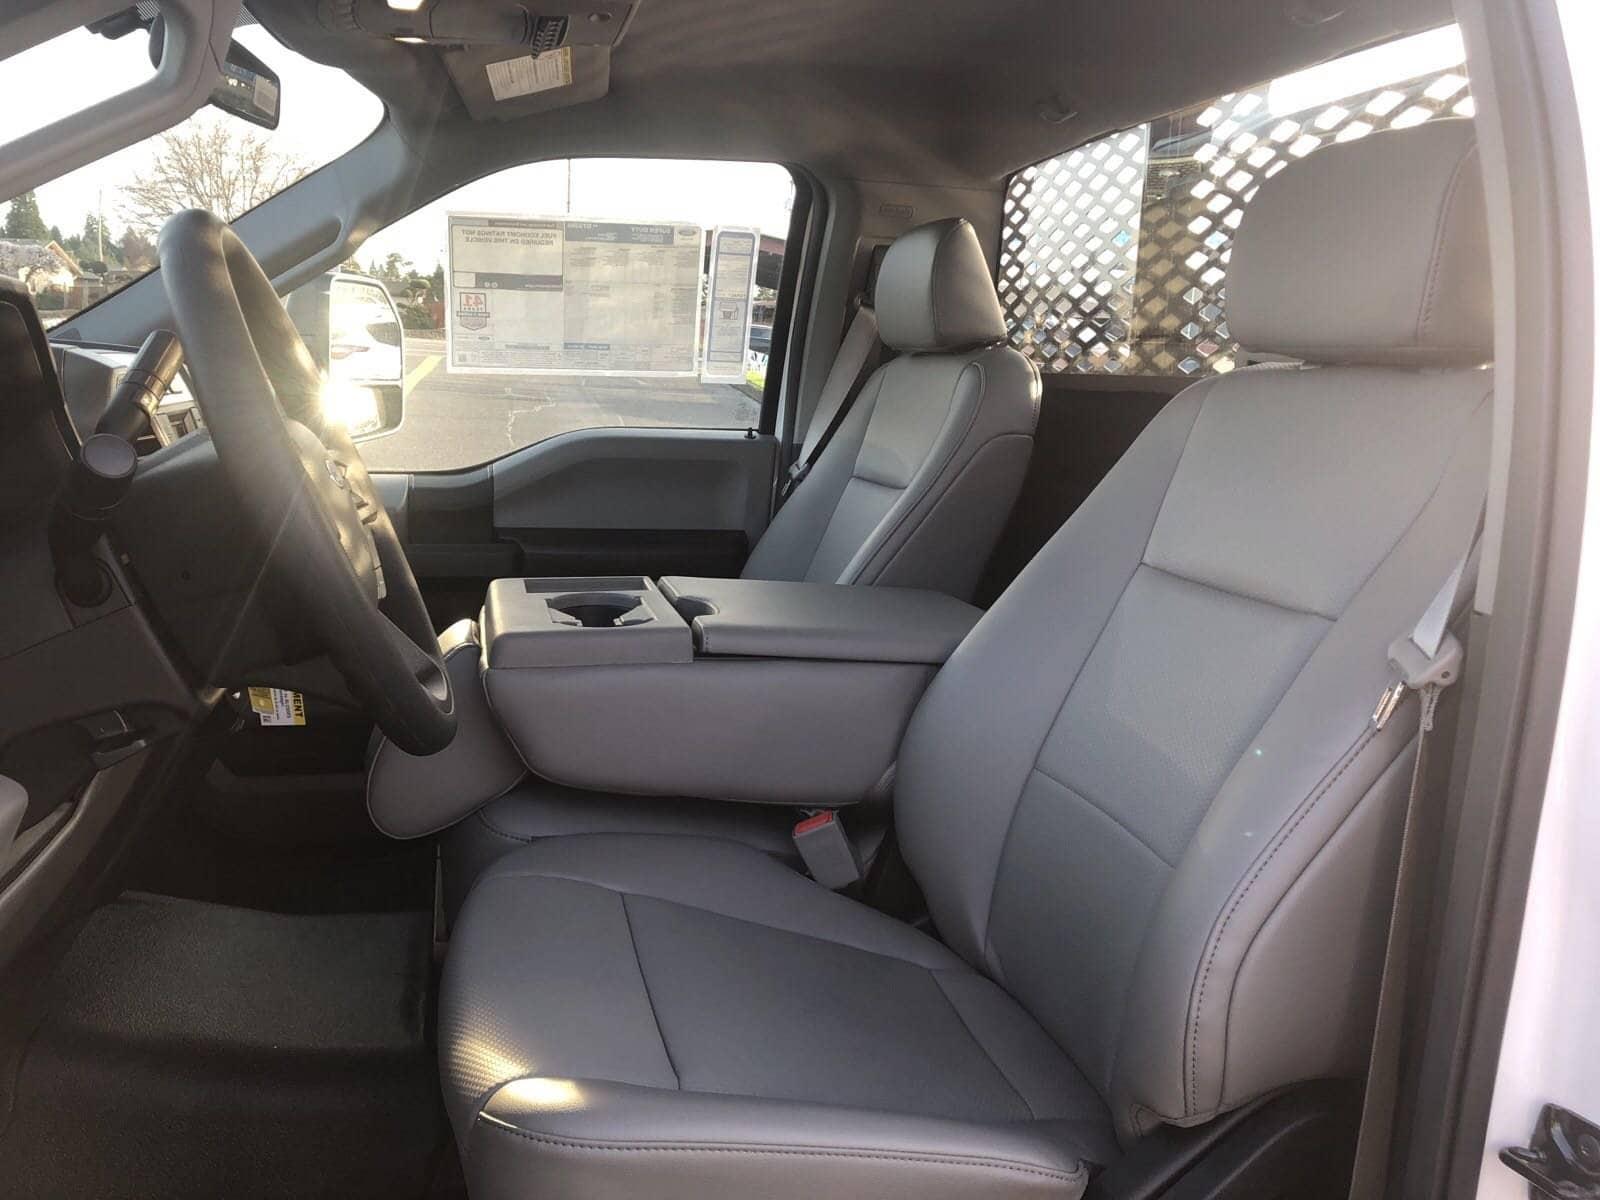 2019 F-350 Regular Cab DRW 4x4,  Scelzi Platform Body #299649 - photo 24